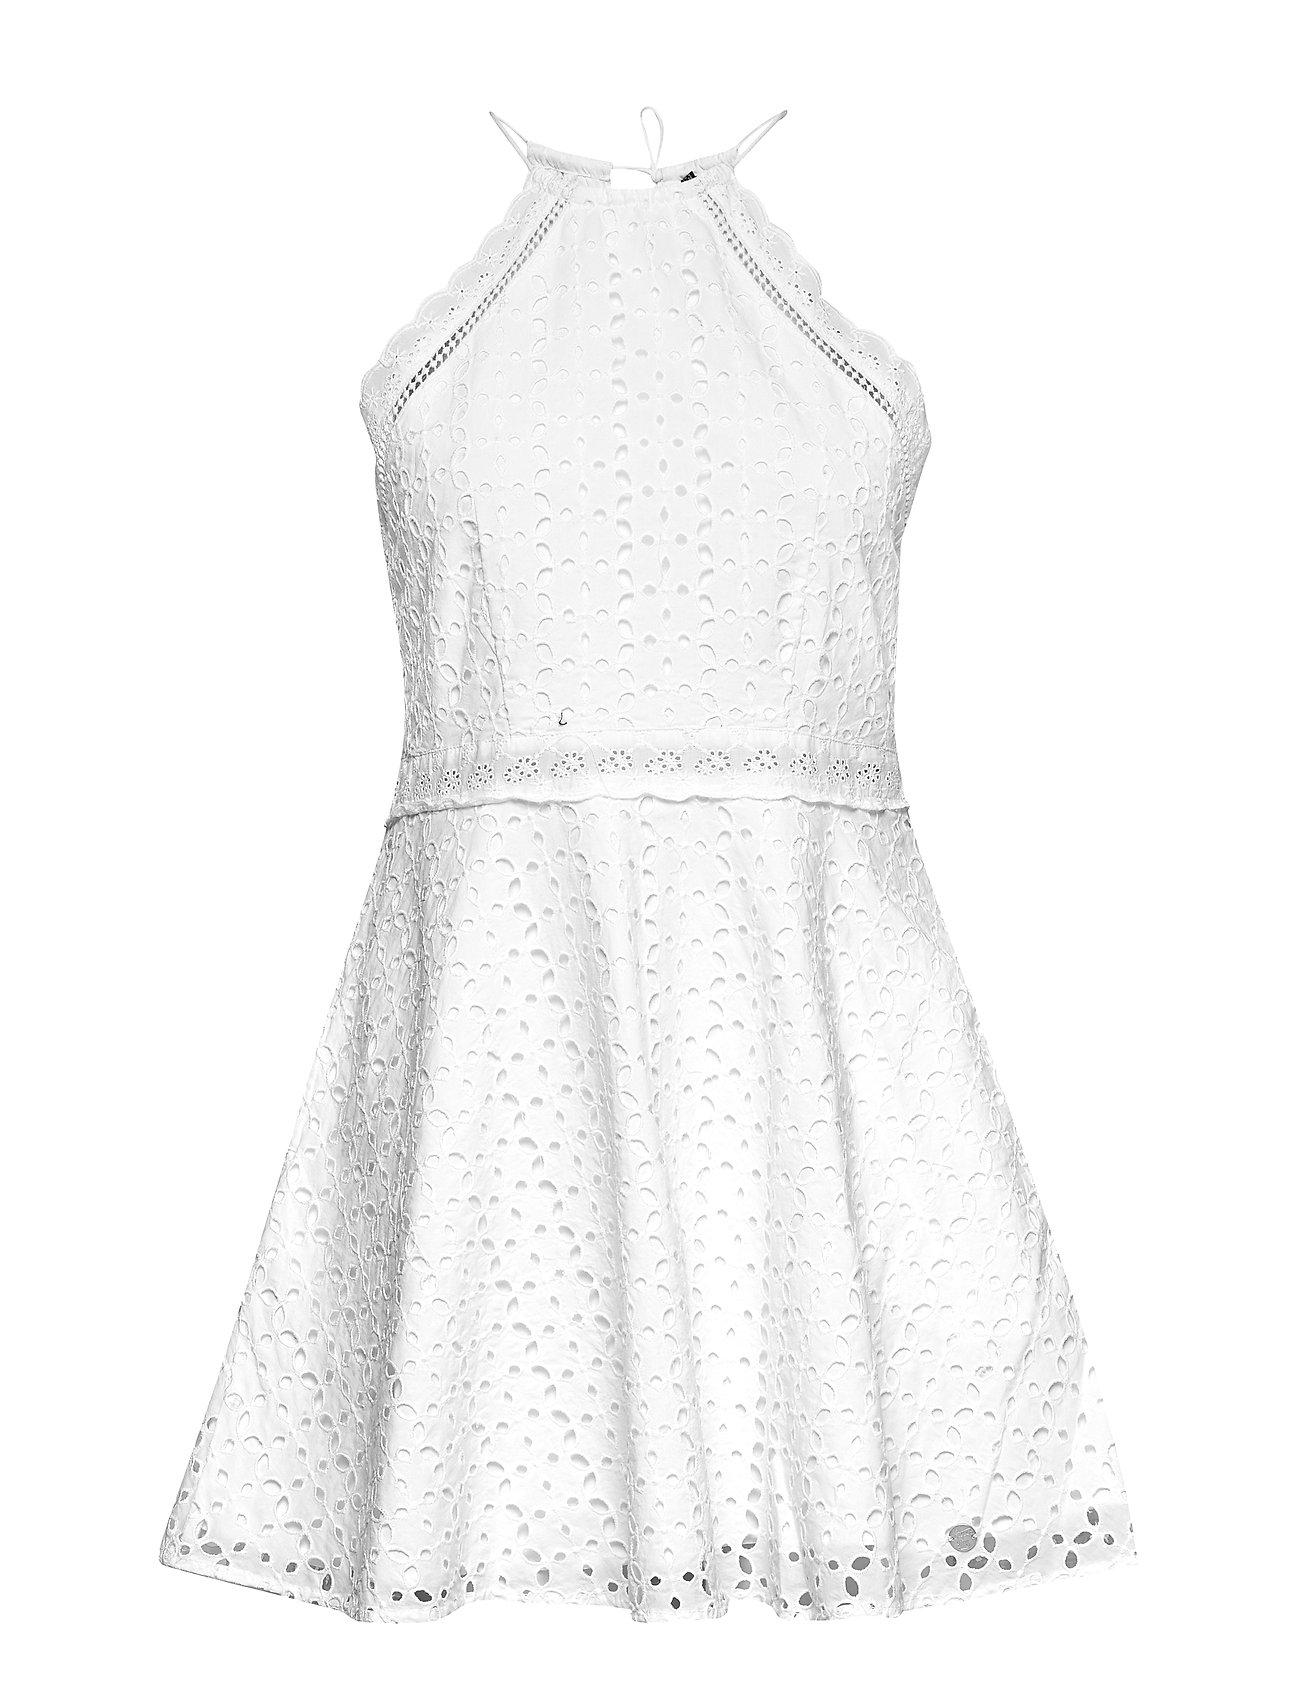 Superdry TEAGAN HALTER DRESS - WHITE